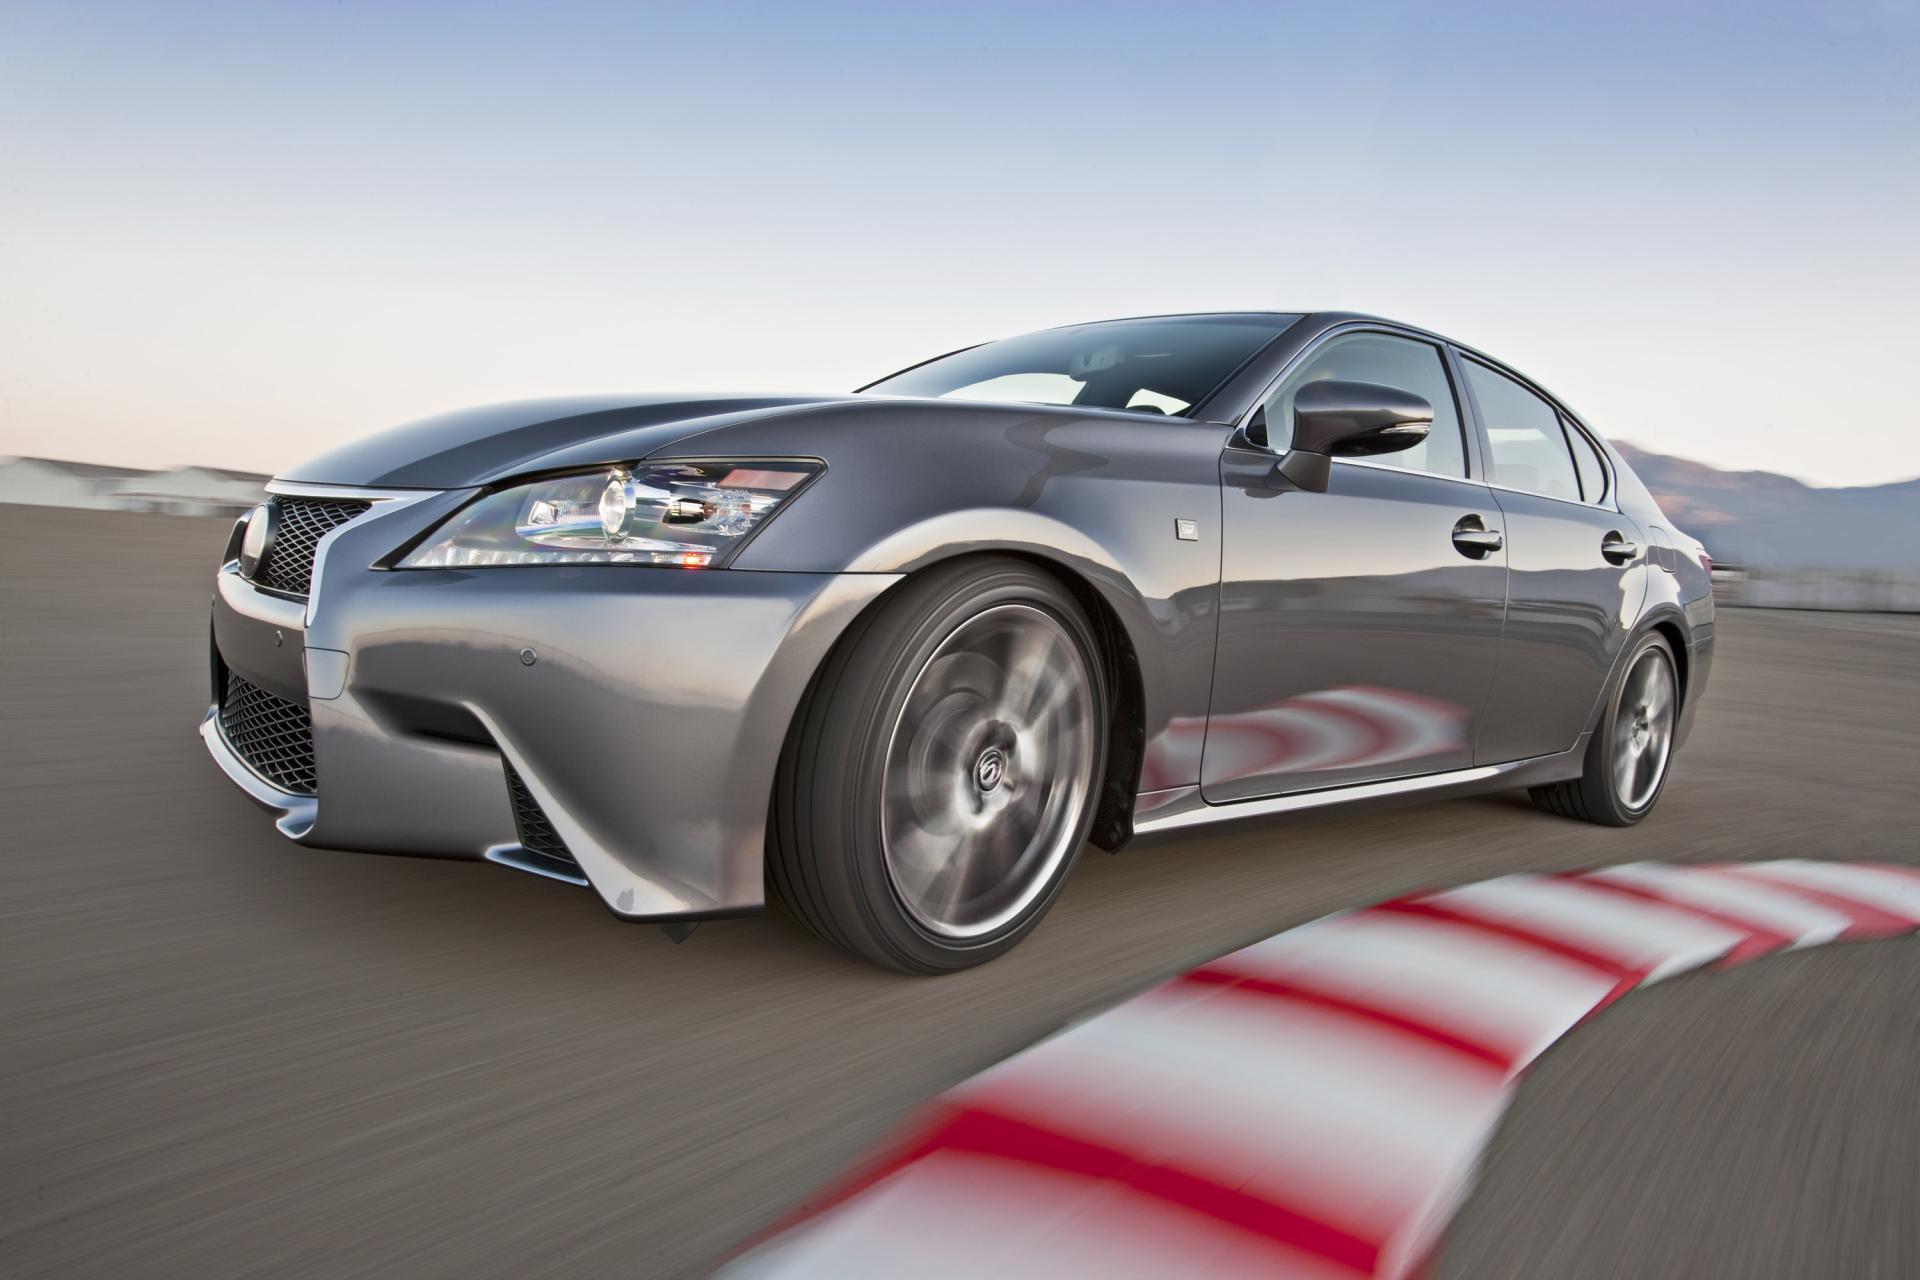 2013 Lexus GS 350 F SPORT Package News And Information   Conceptcarz.com